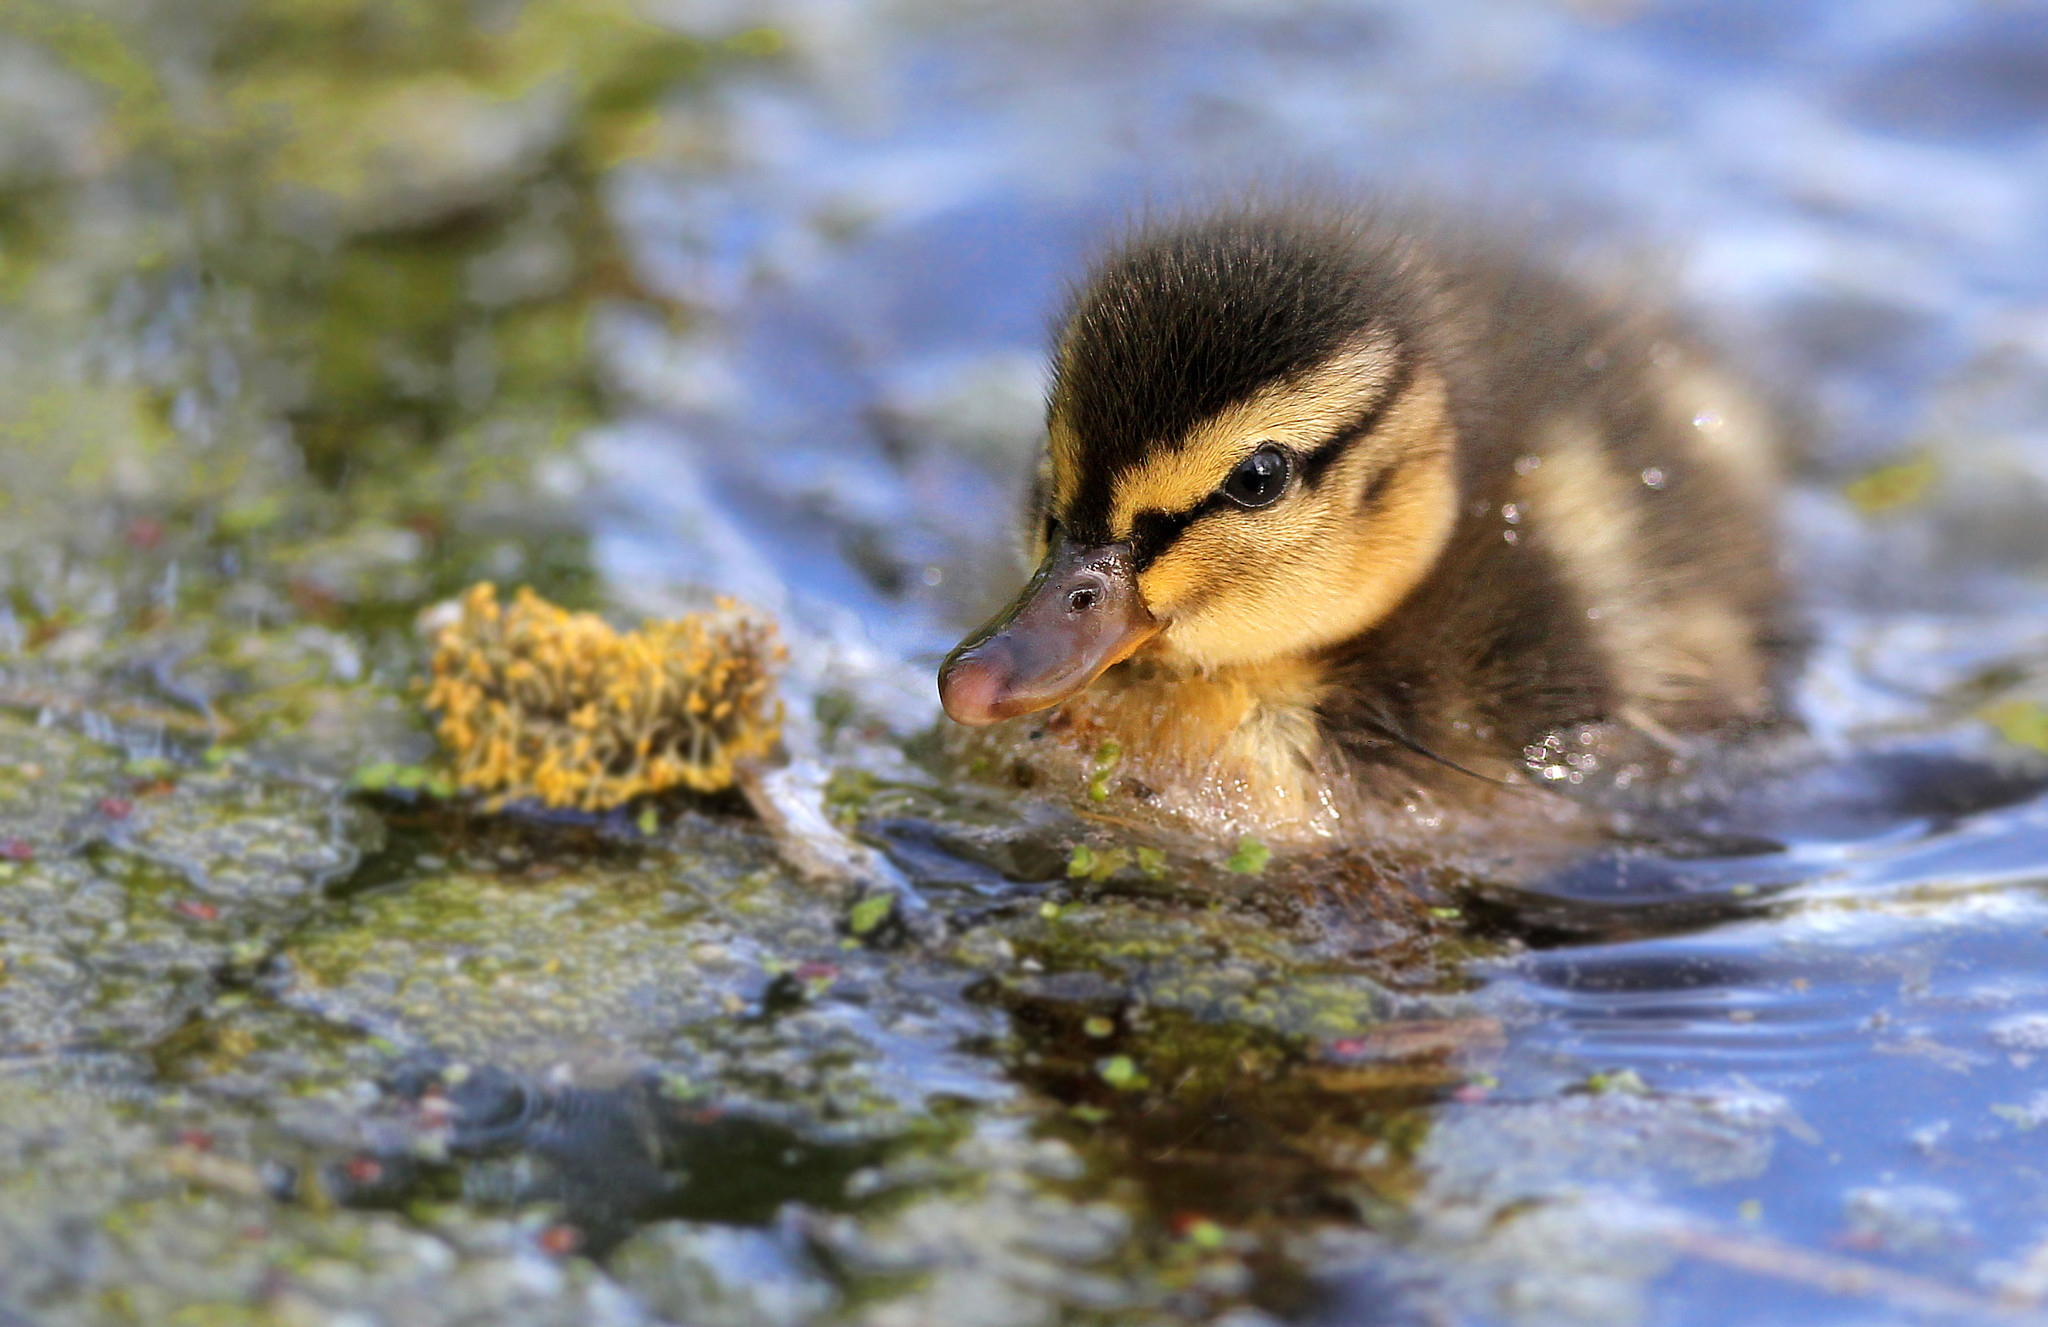 Res: 2048x1327, Tiere - Ente See Wasser Natur Süß Wallpaper